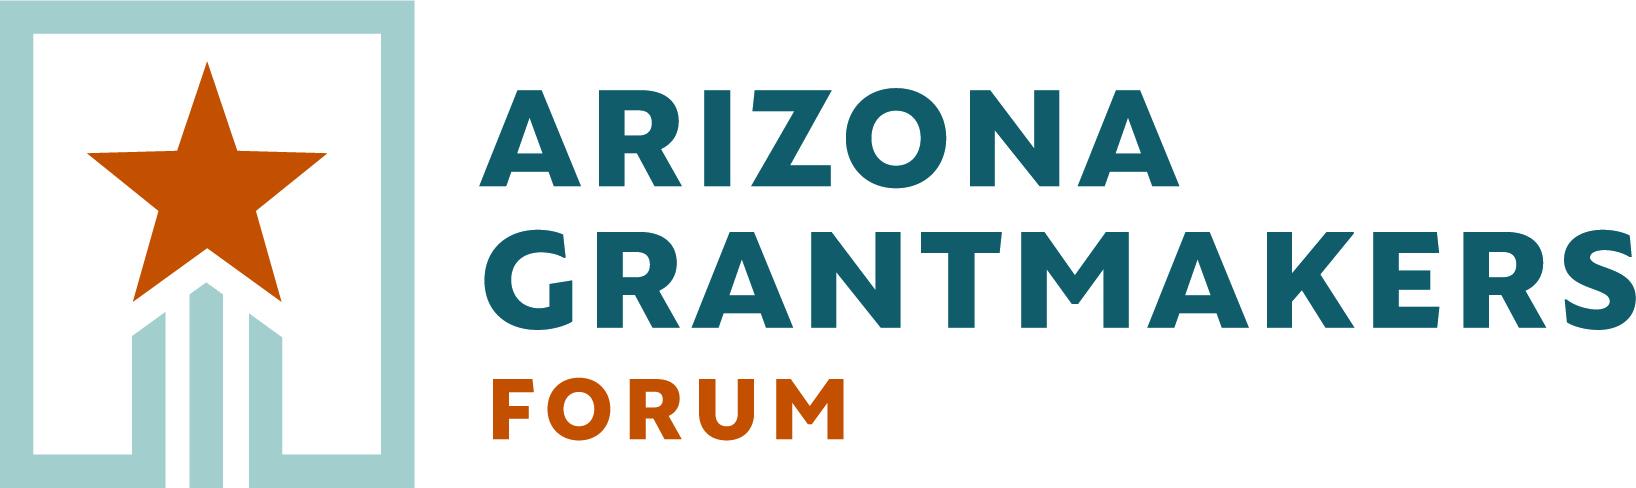 Arizona Grantmakers Forum Primary Logo Four Color - Arizona News